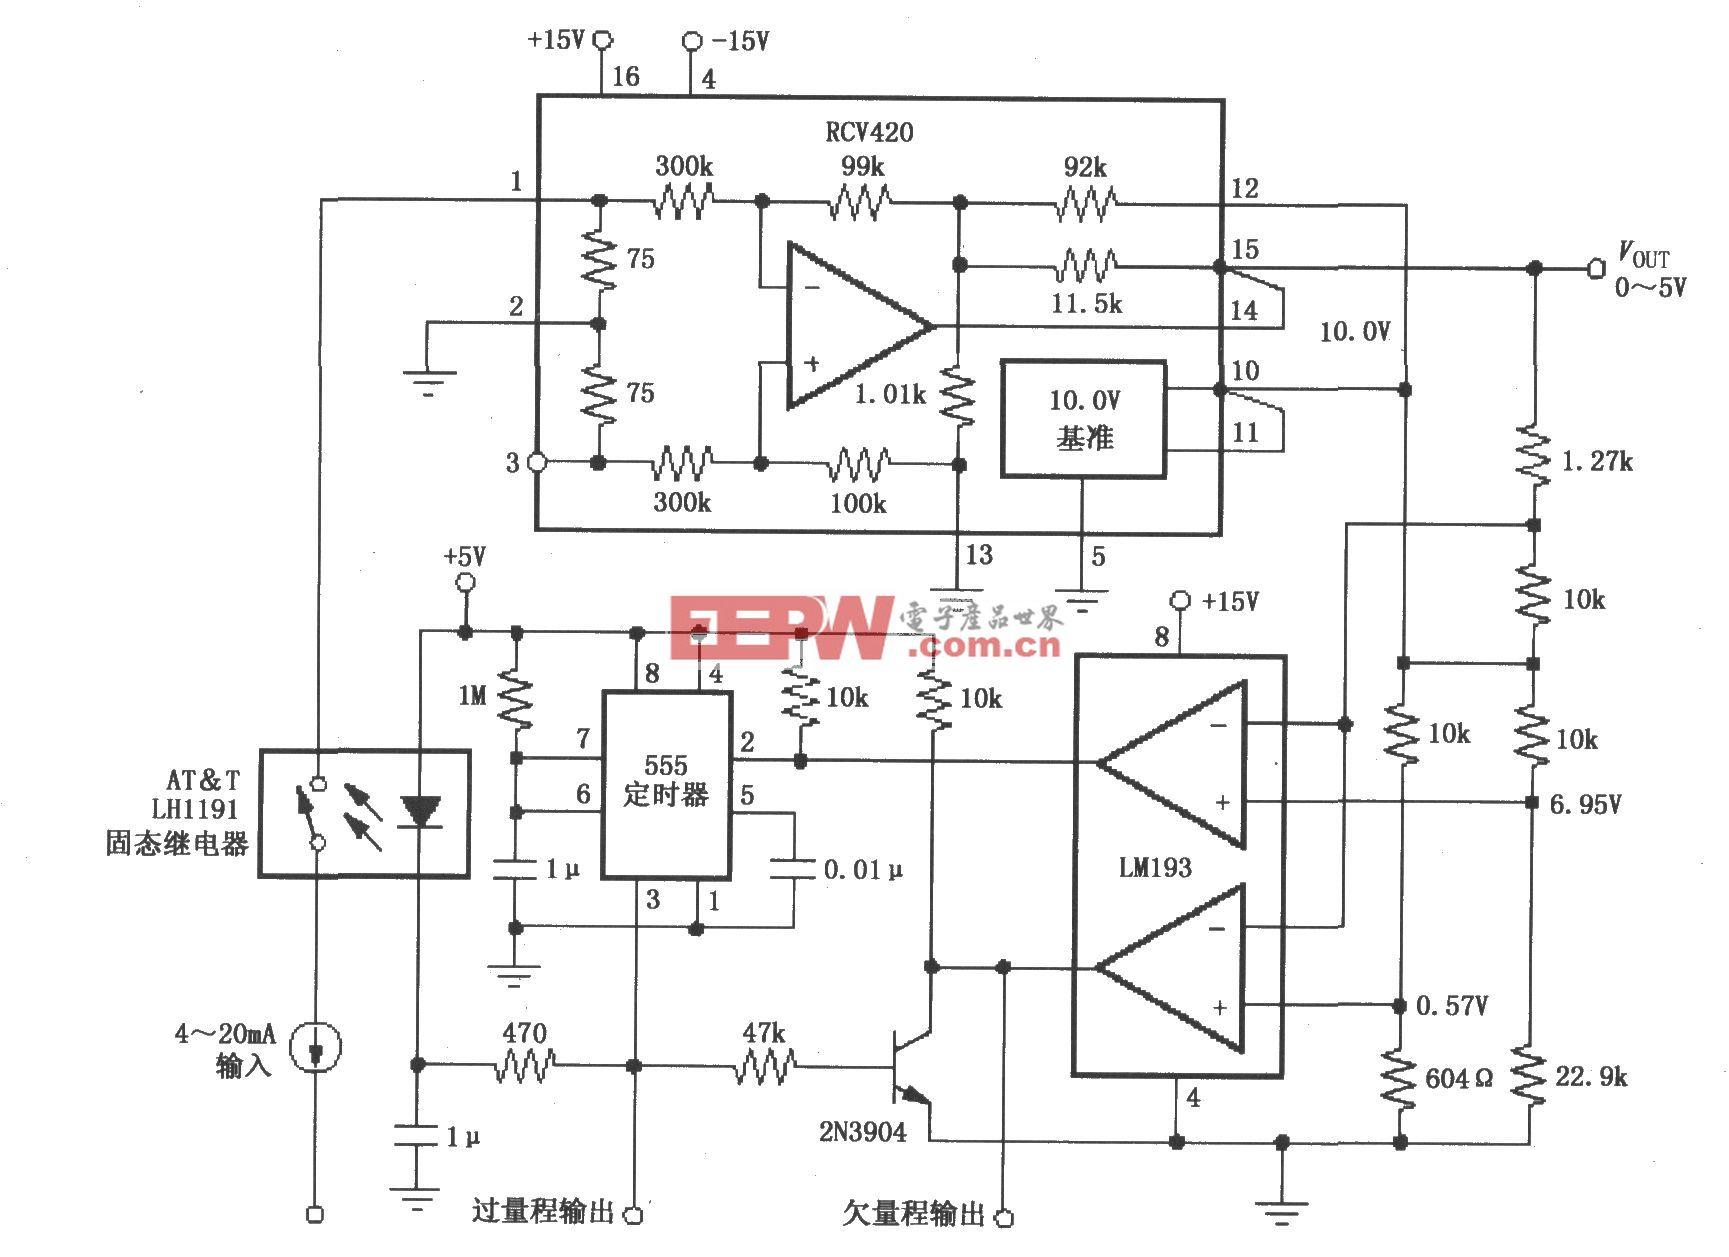 RCV420构成的具有输入过载保护的4~20mA电流环路接收器